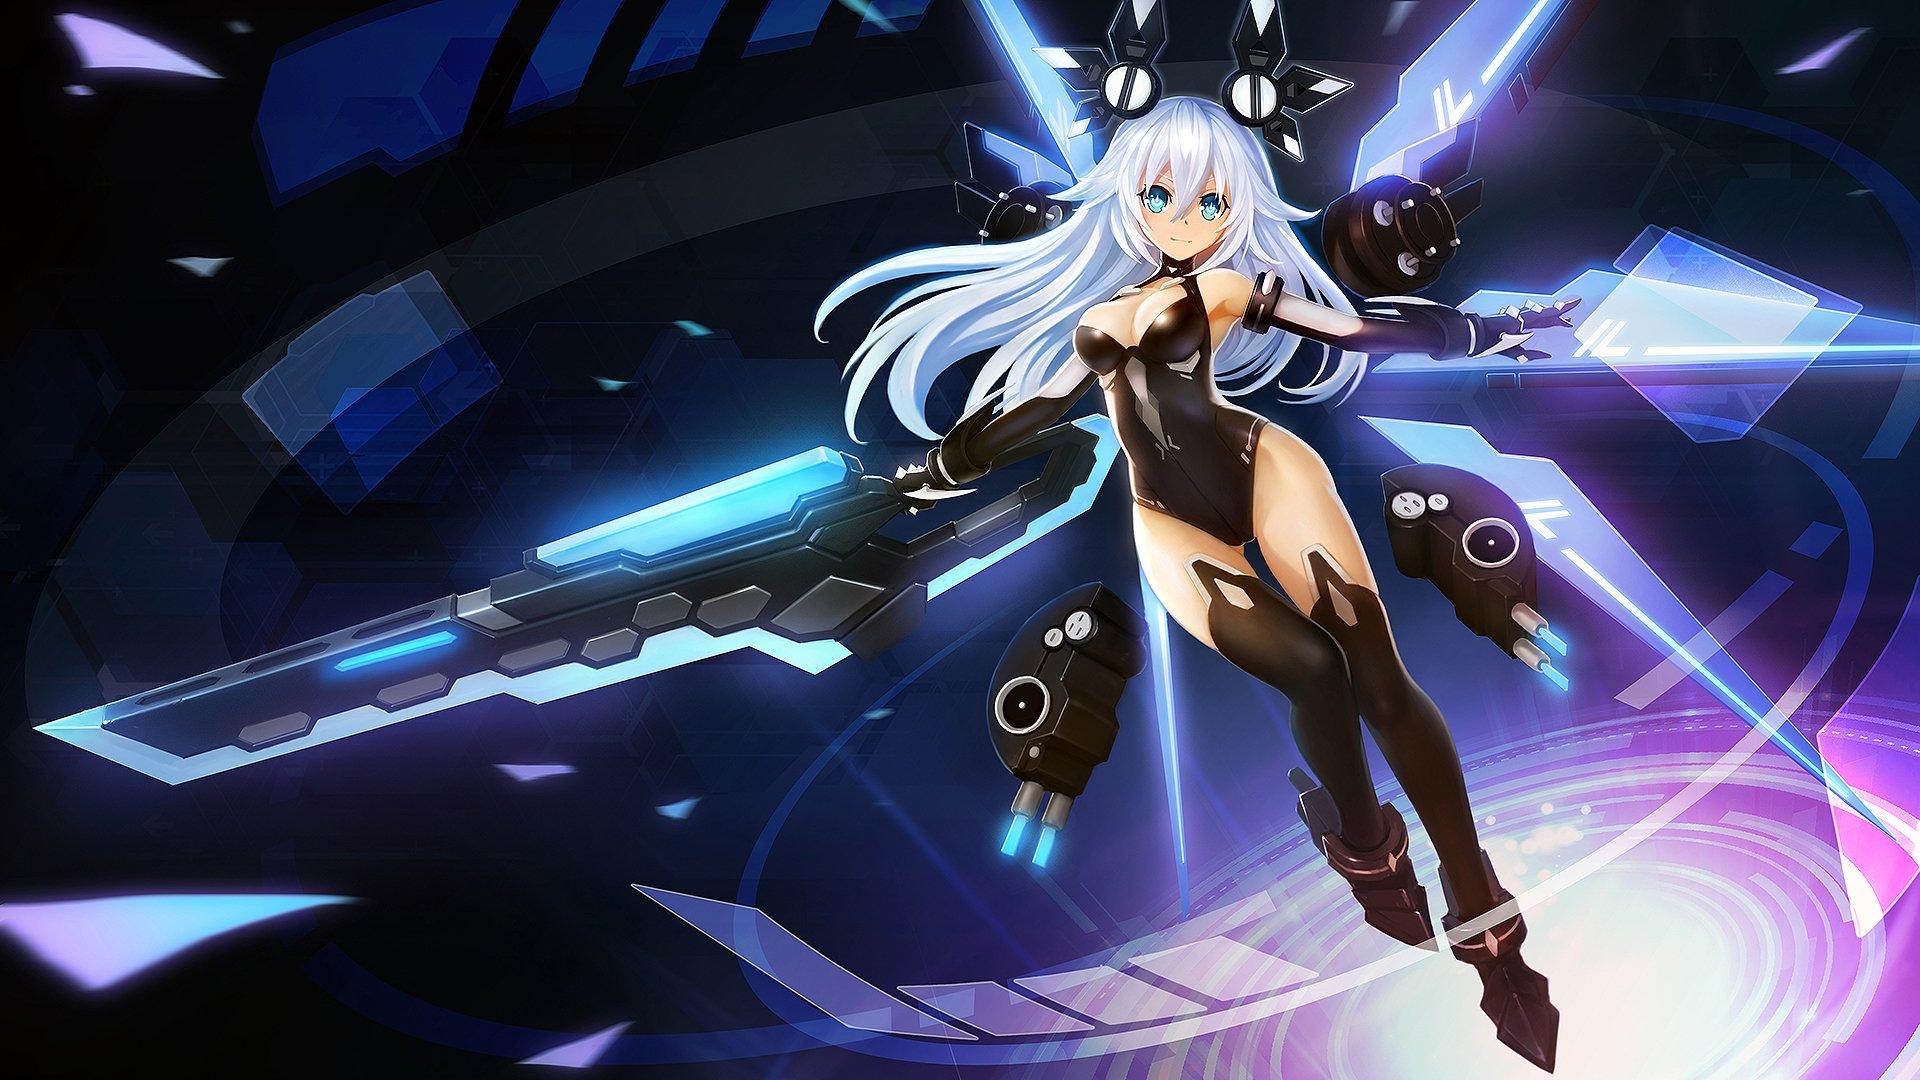 Aqua Eyes Black Heart Breasts Cleavage Hanshu Hyperdimension Neptunia Leotard Long Hair